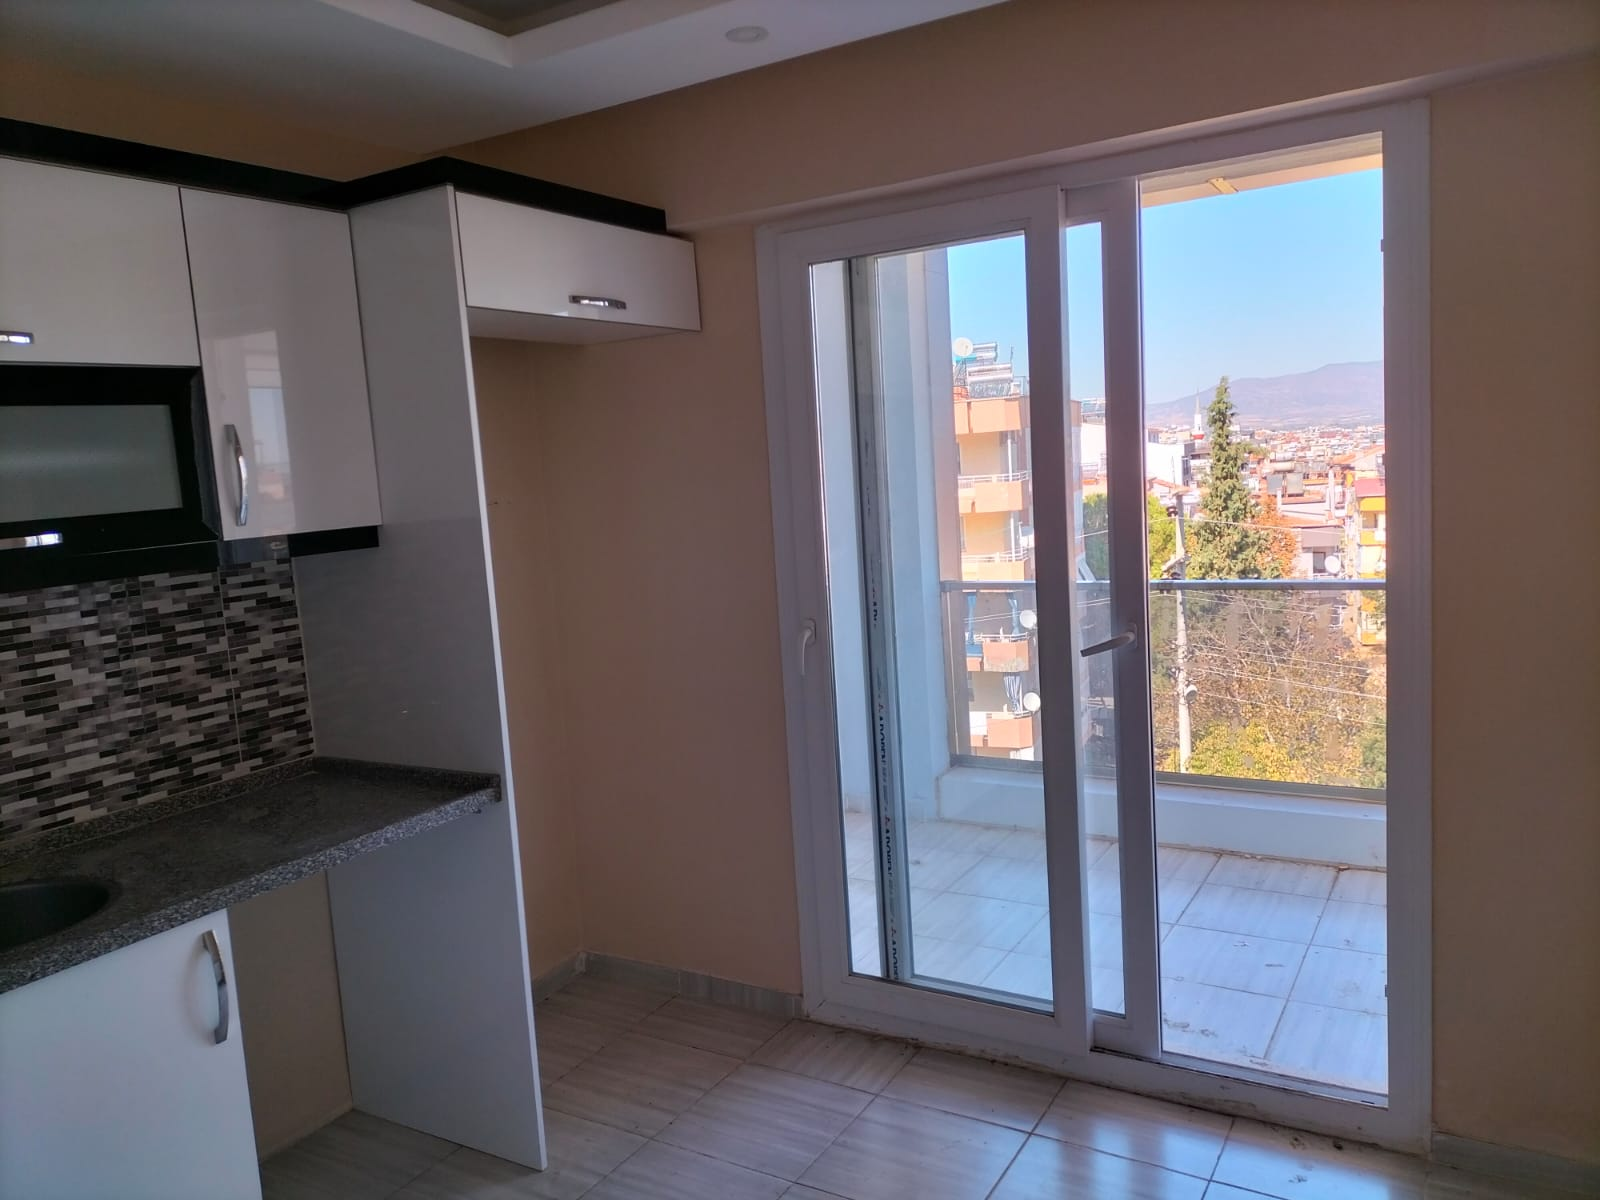 Aksoy mahallesinde kiralık 2+1 daire